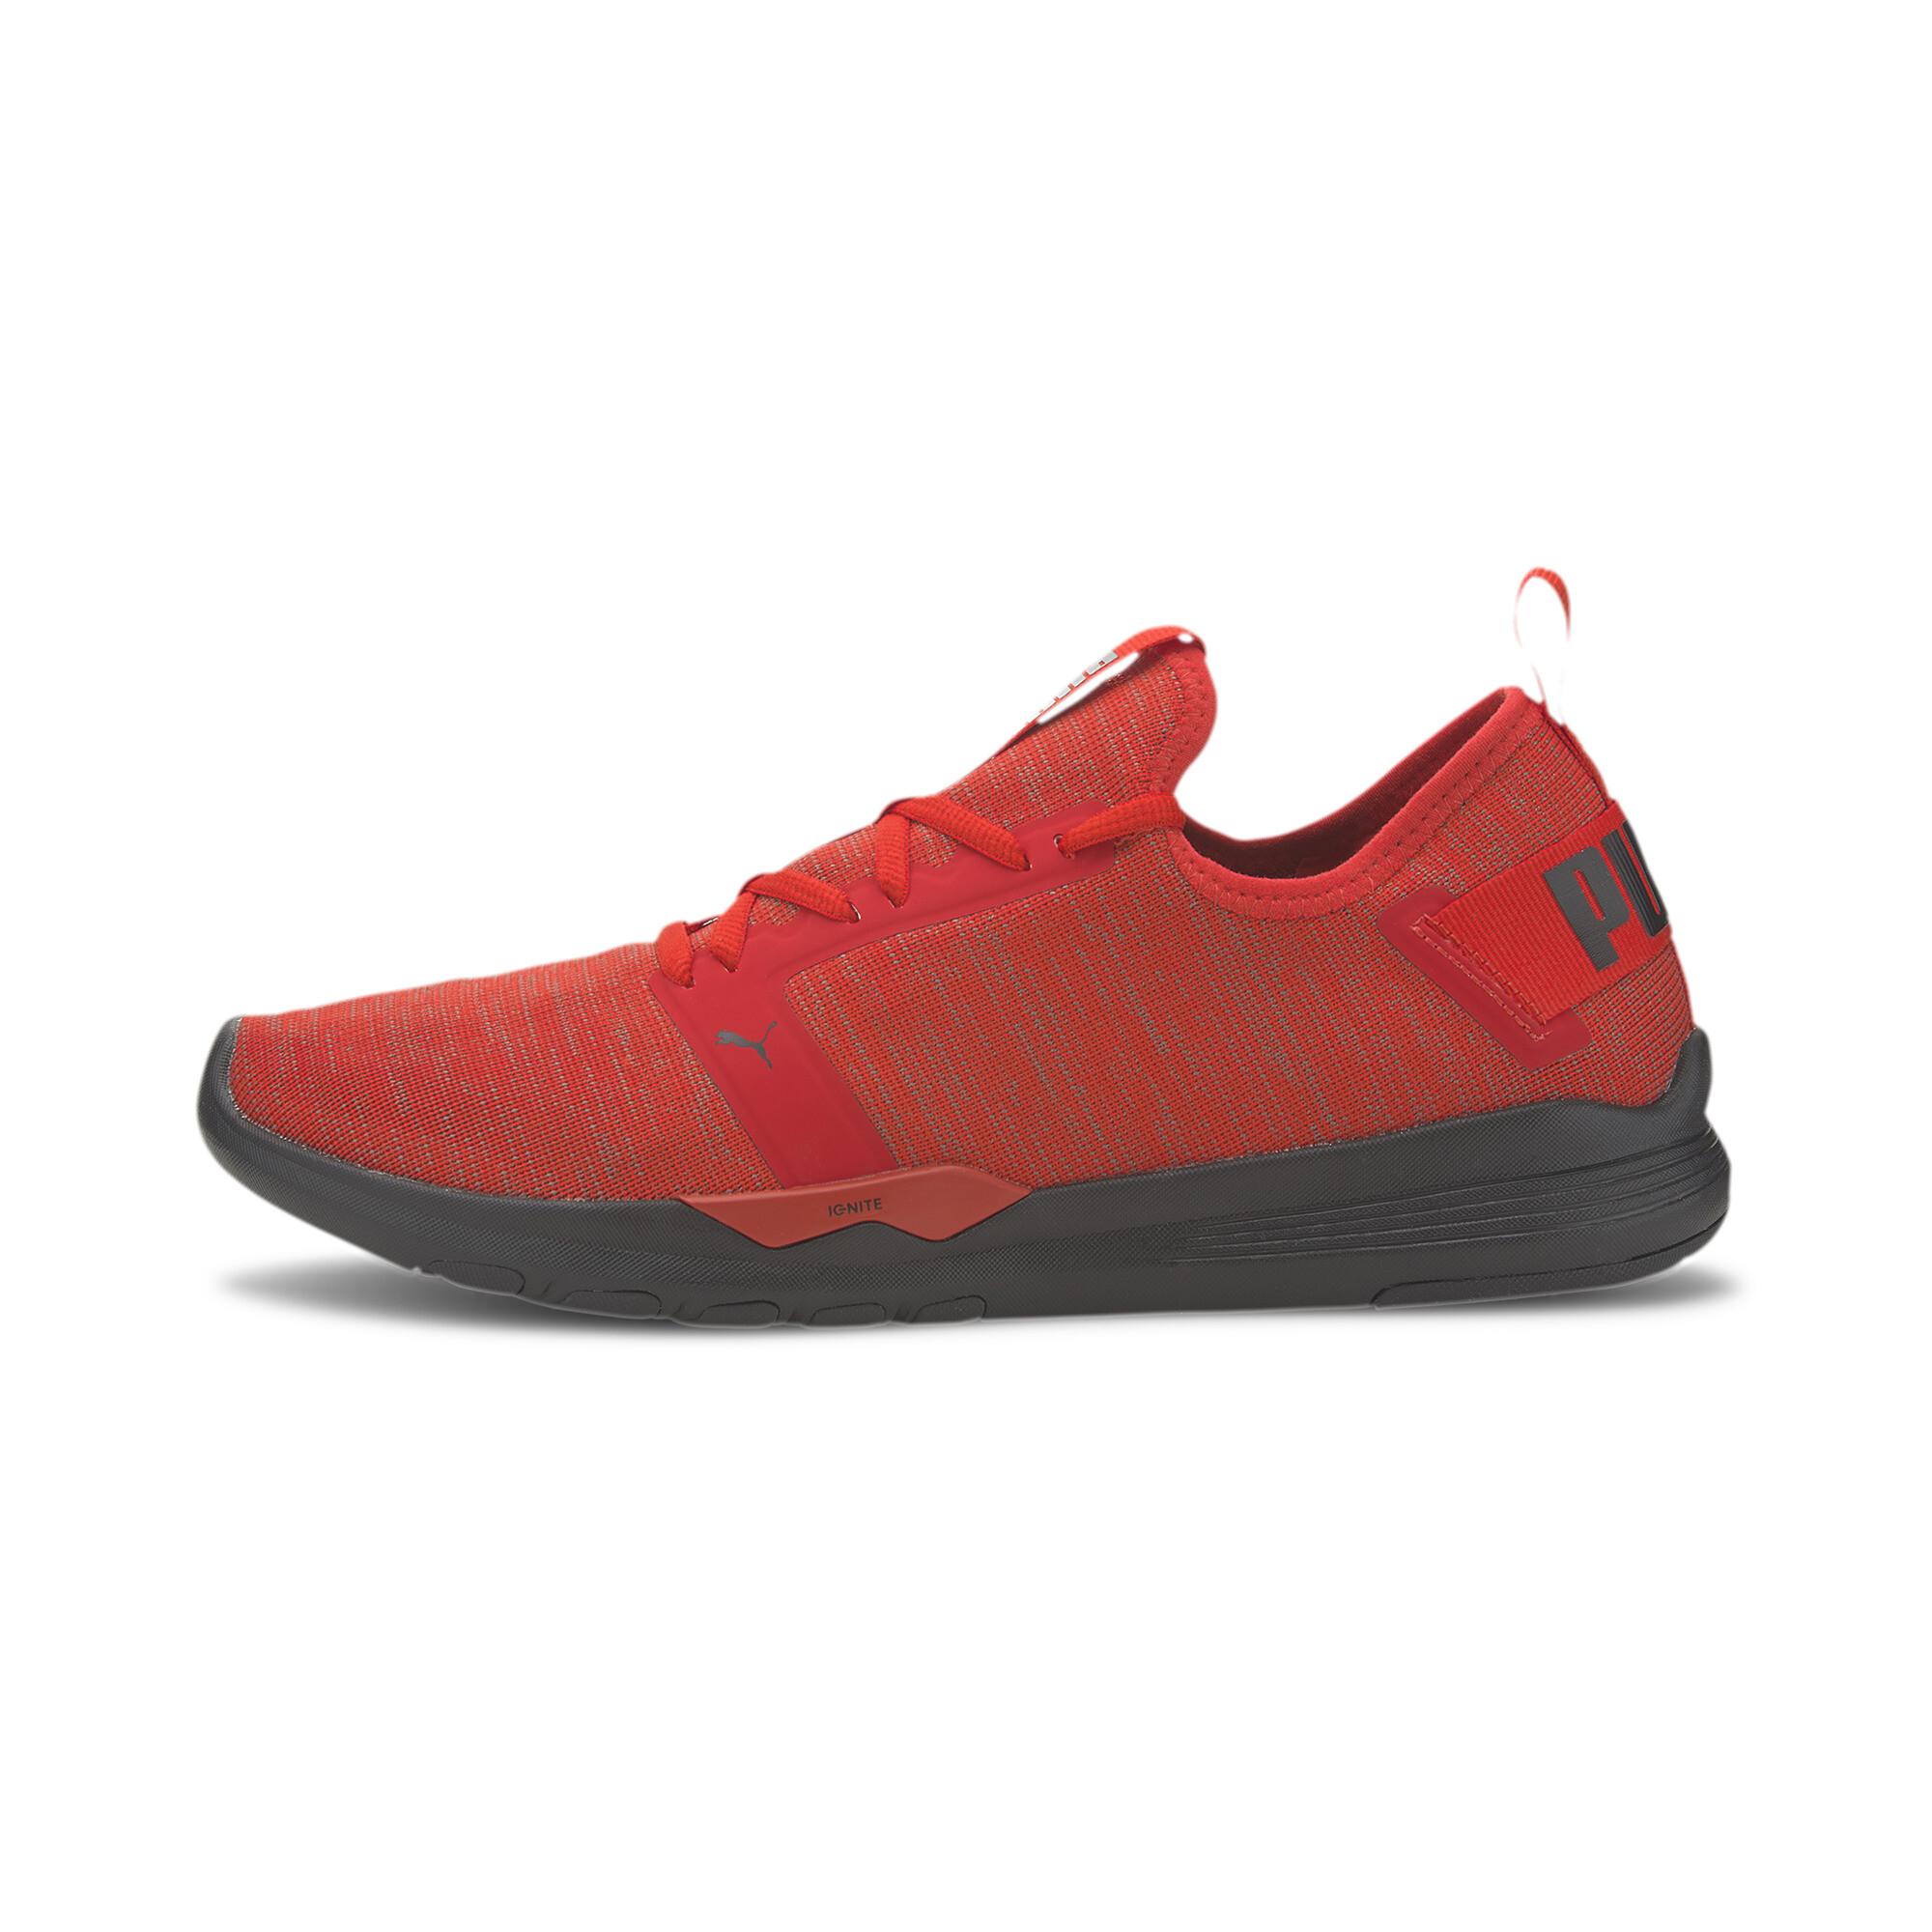 PUMA-Men-039-s-IGNITE-Contender-Knit-Running-Shoes thumbnail 16